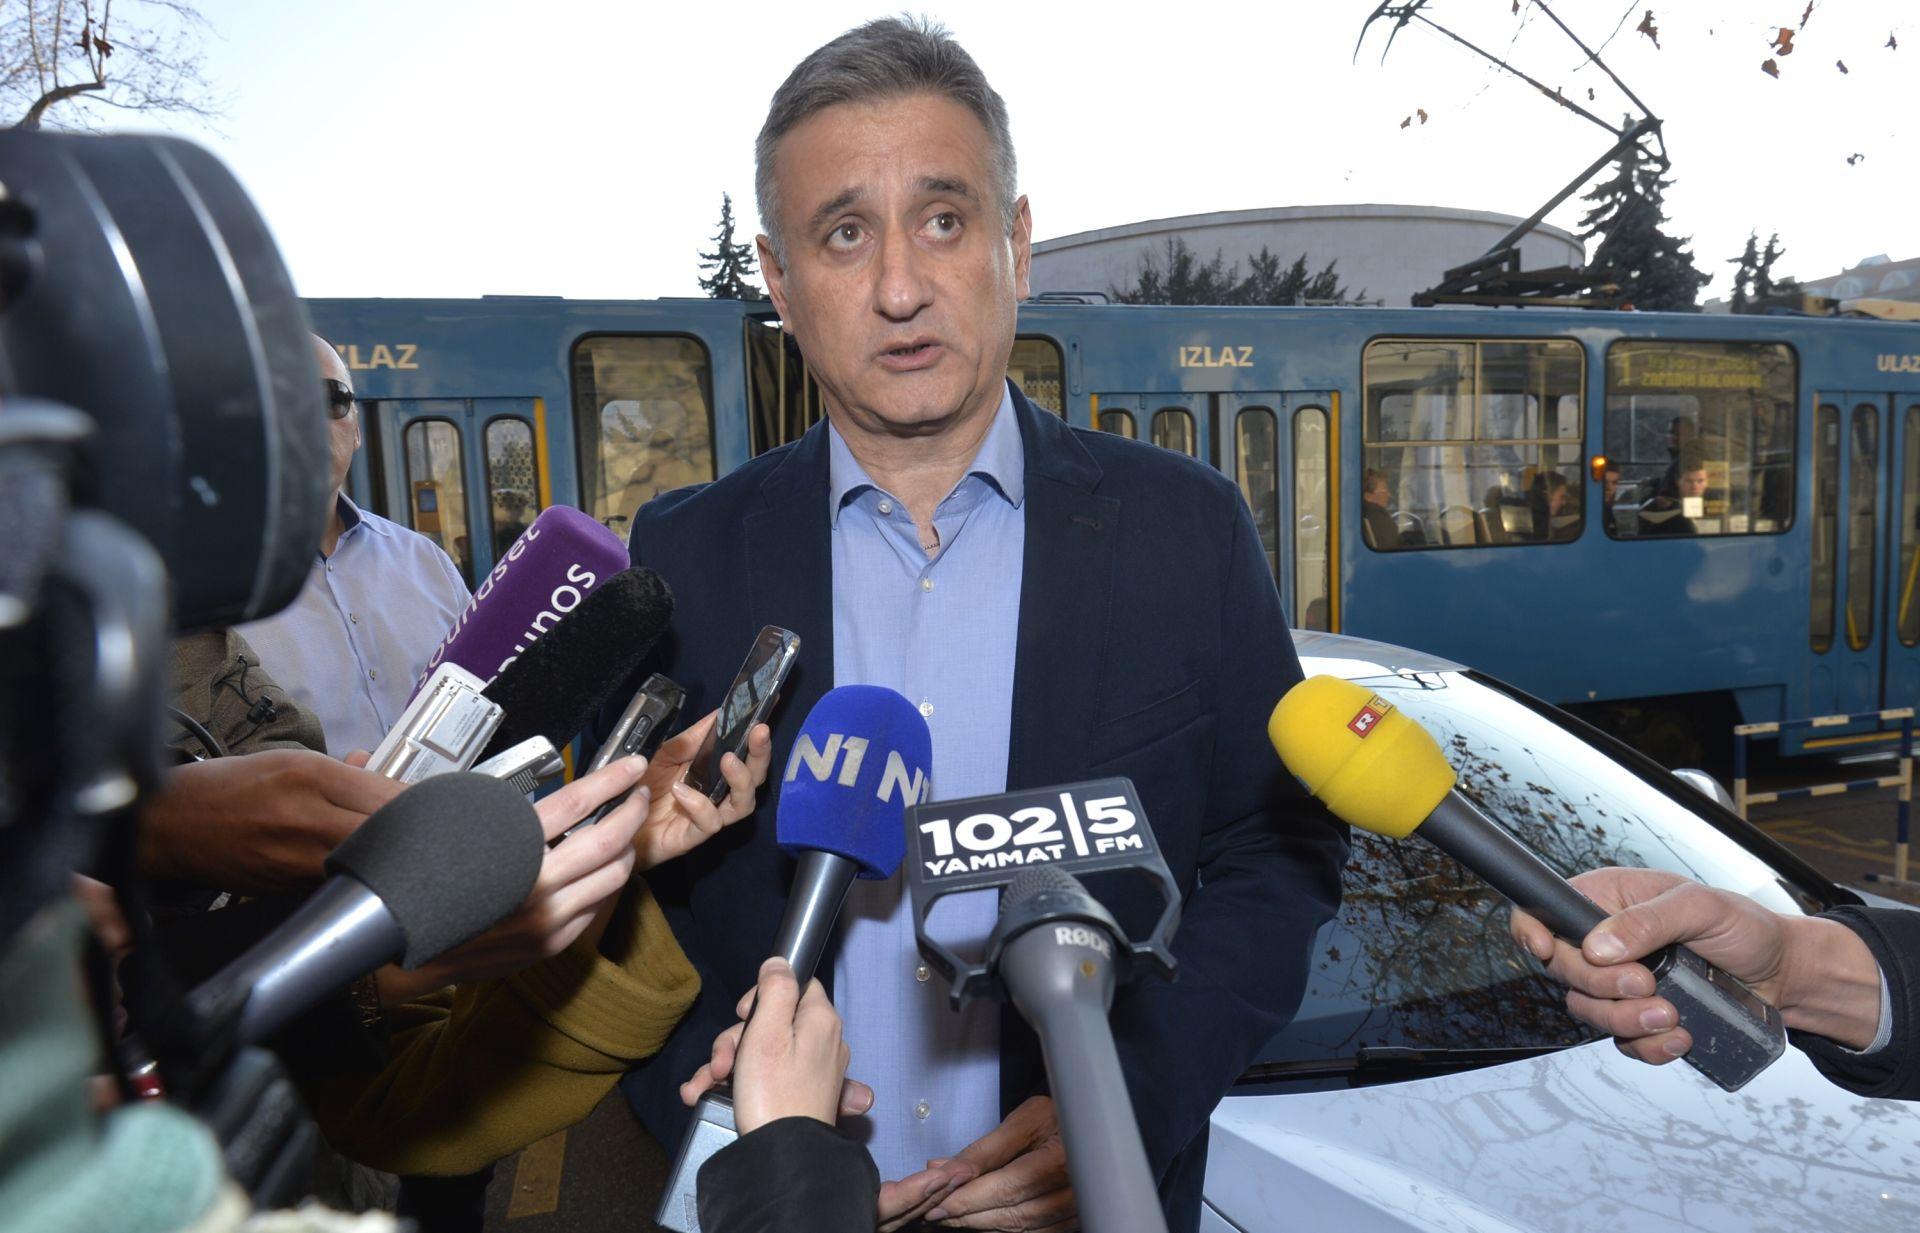 HDZ odgovorio Mostu, ali bez spominjanja tripartitne vlade